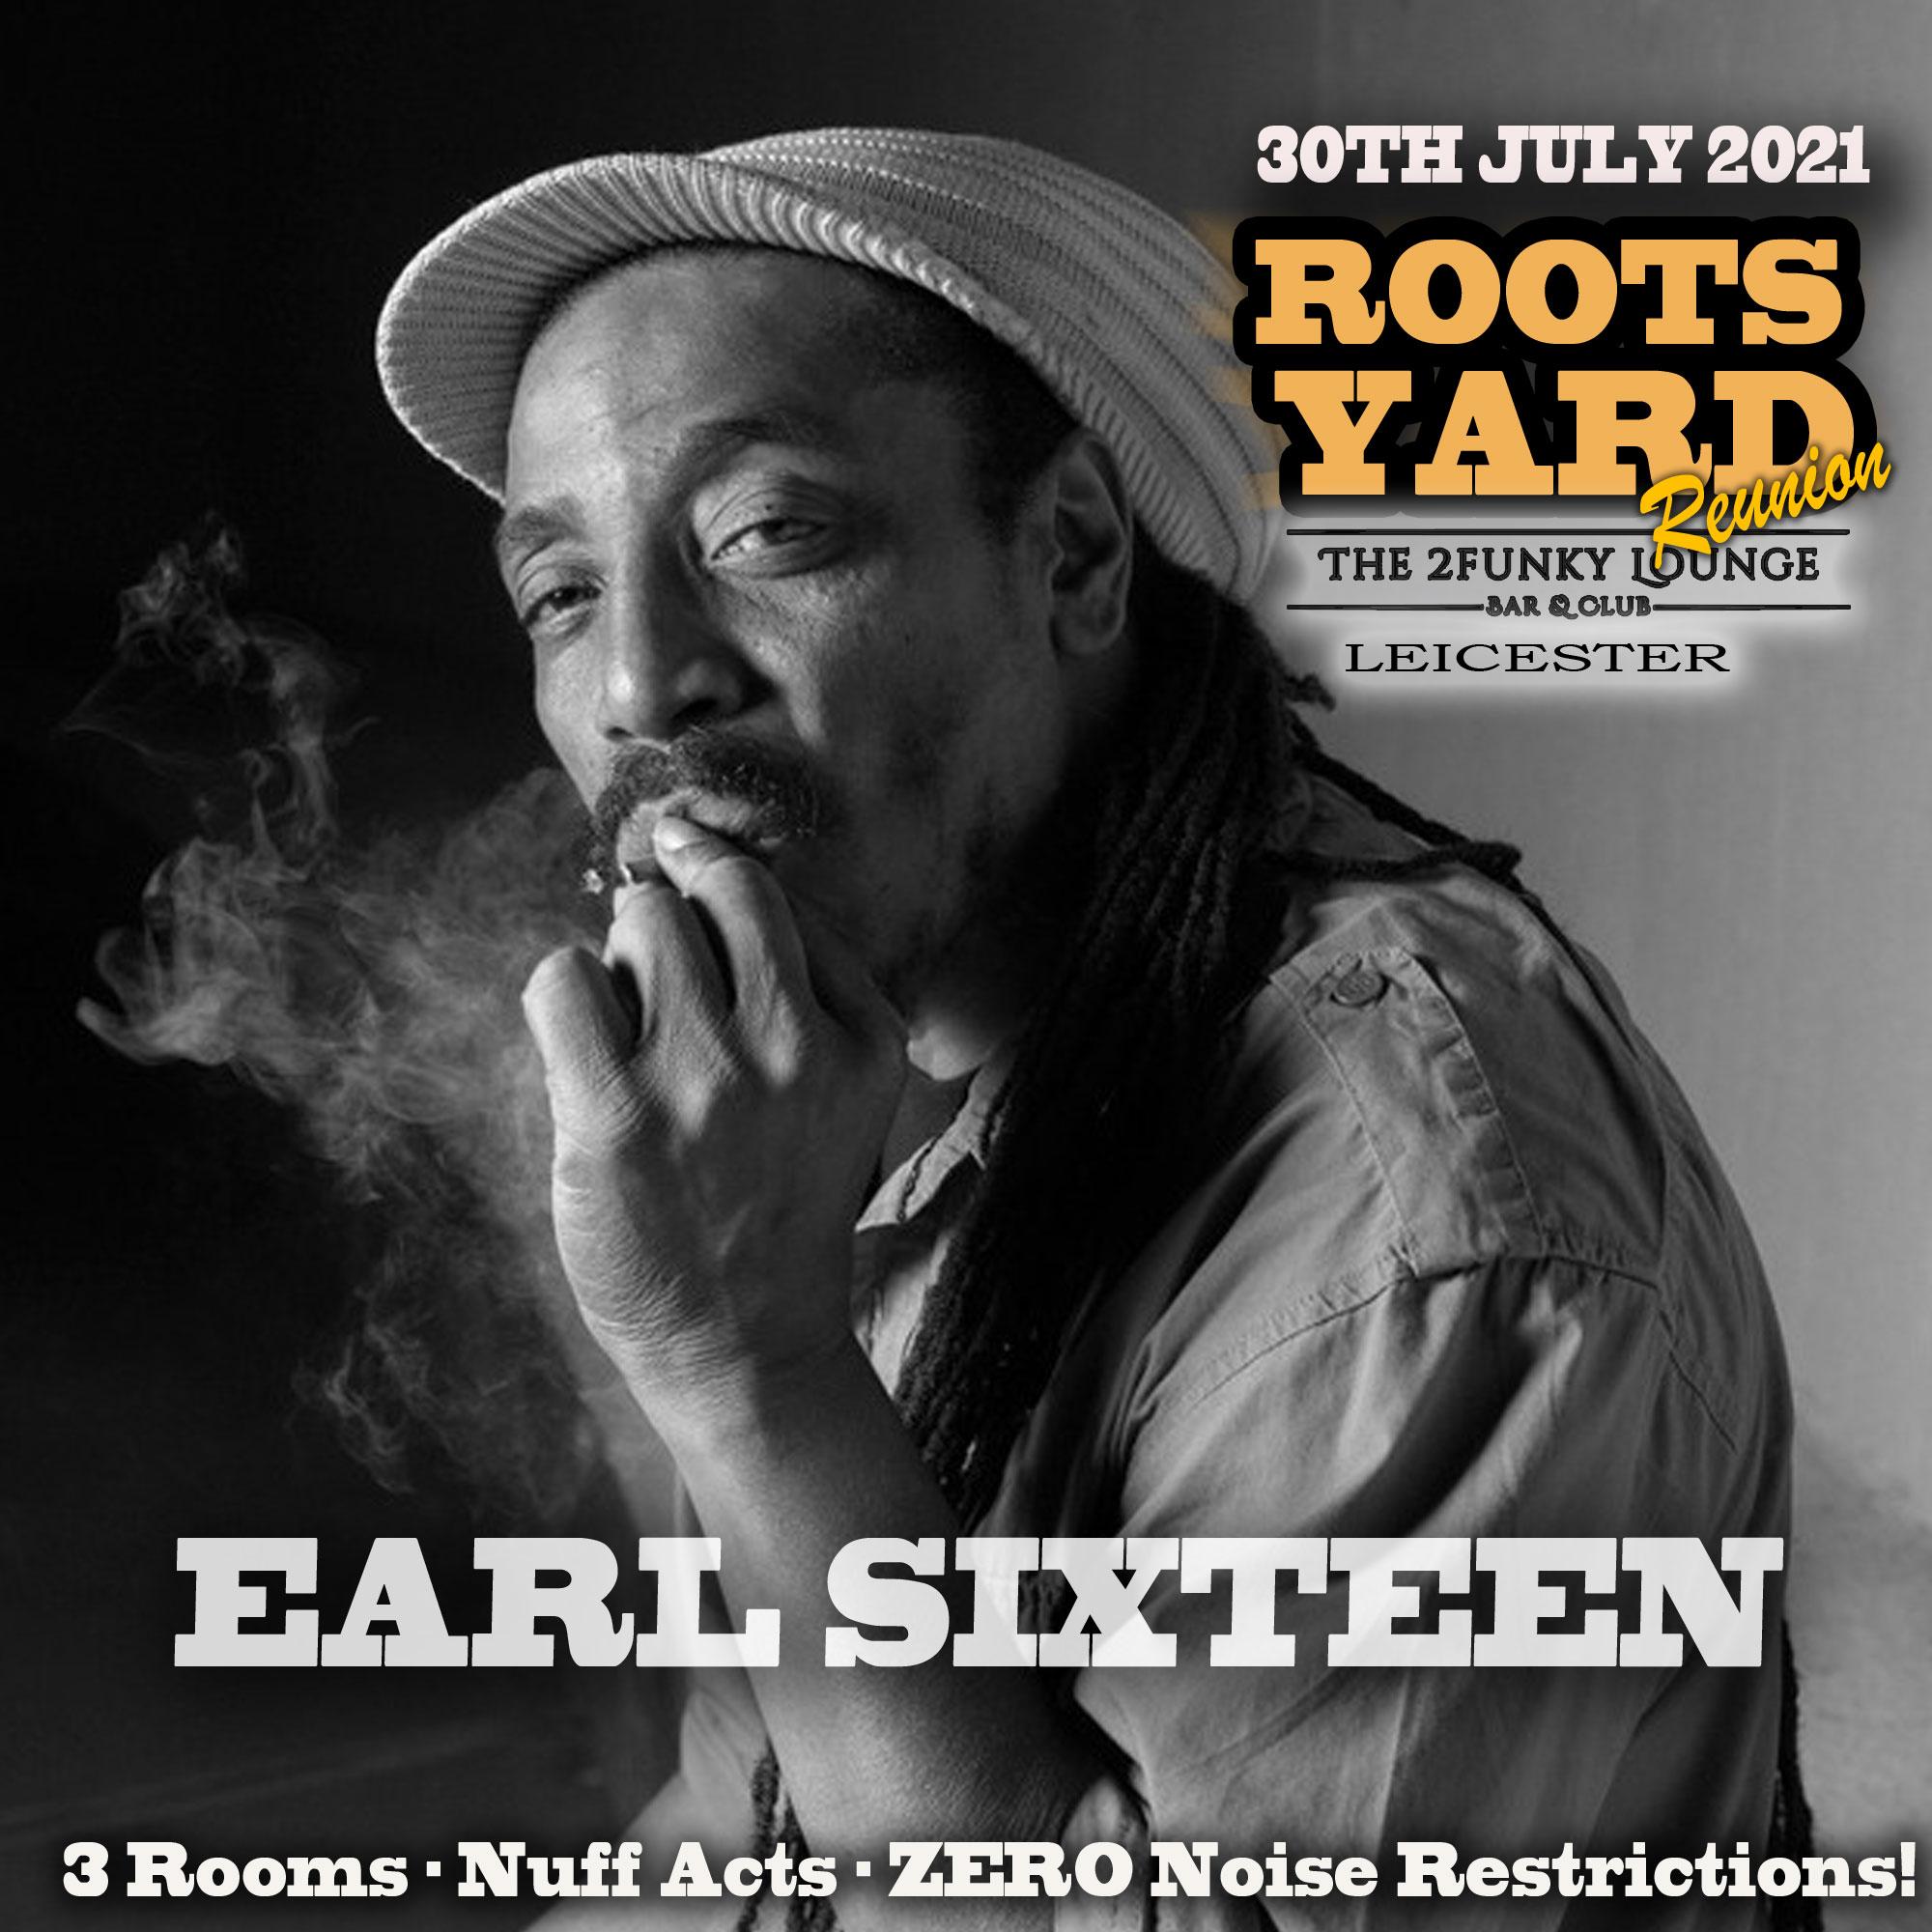 EARL16----roots-yard-reunion-insta-post